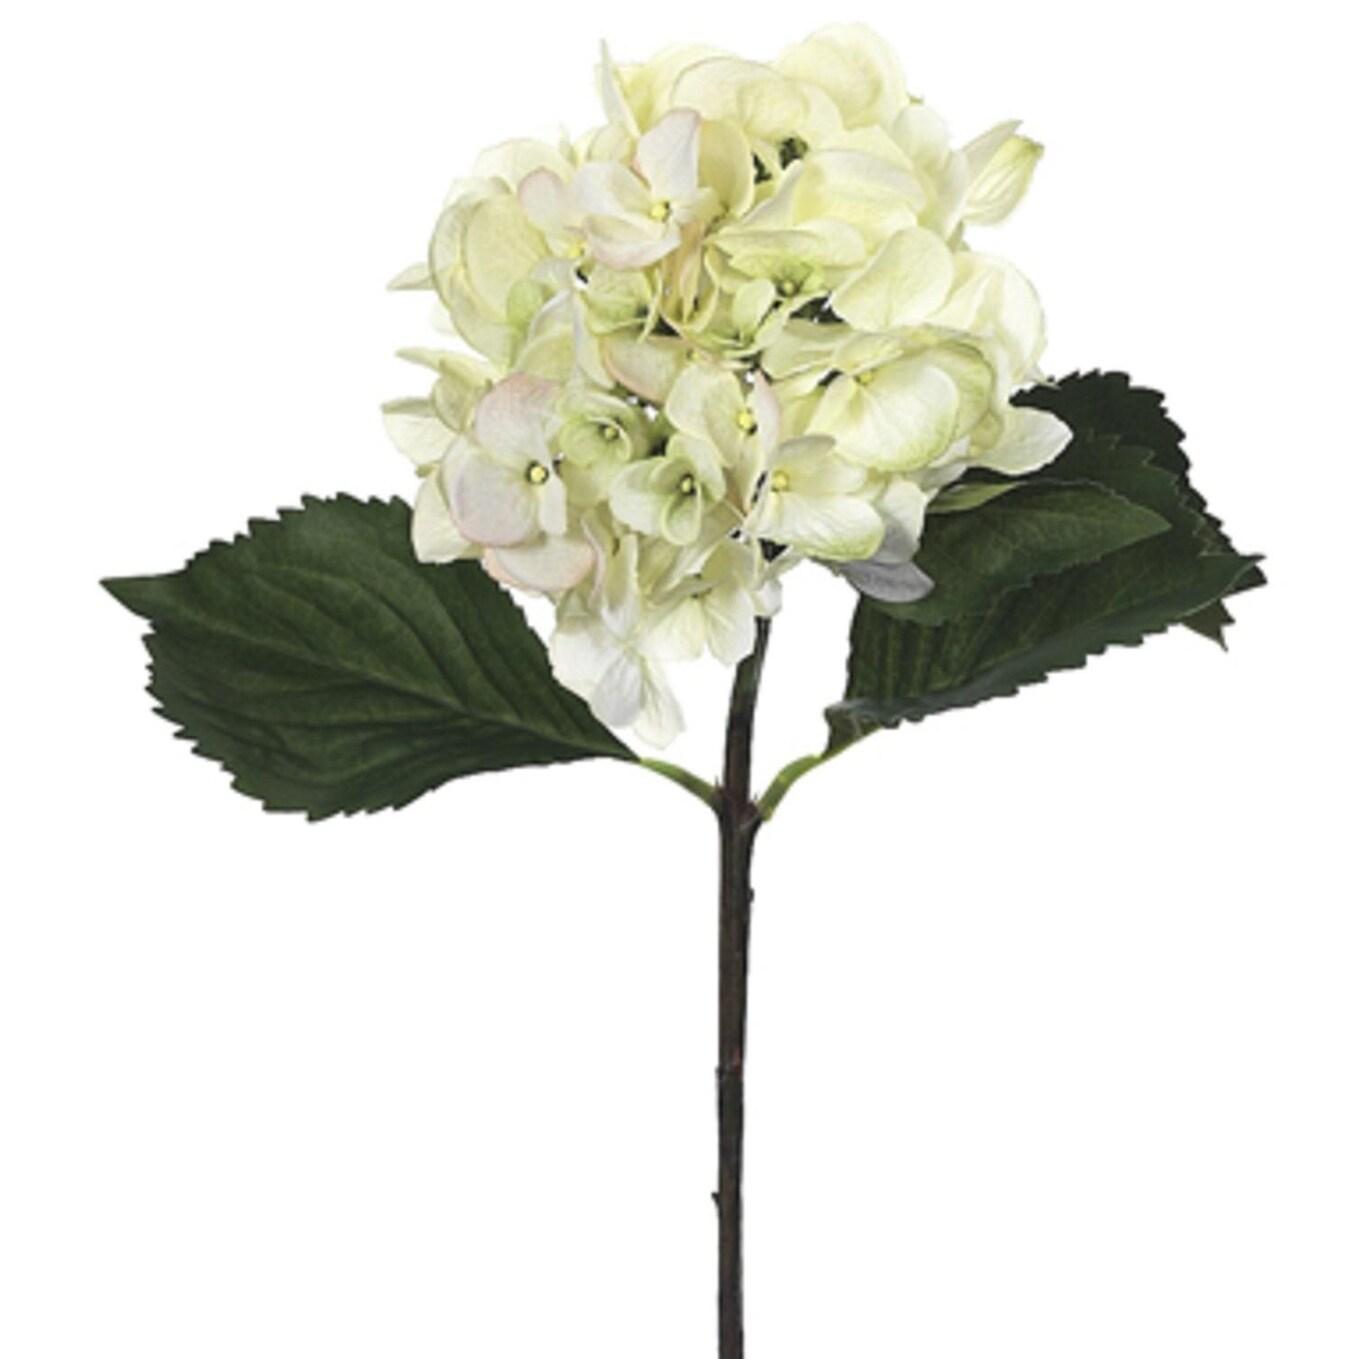 Shop Club Pack Of 12 Artificial Cream Hydrangea Silk Flower Sprays